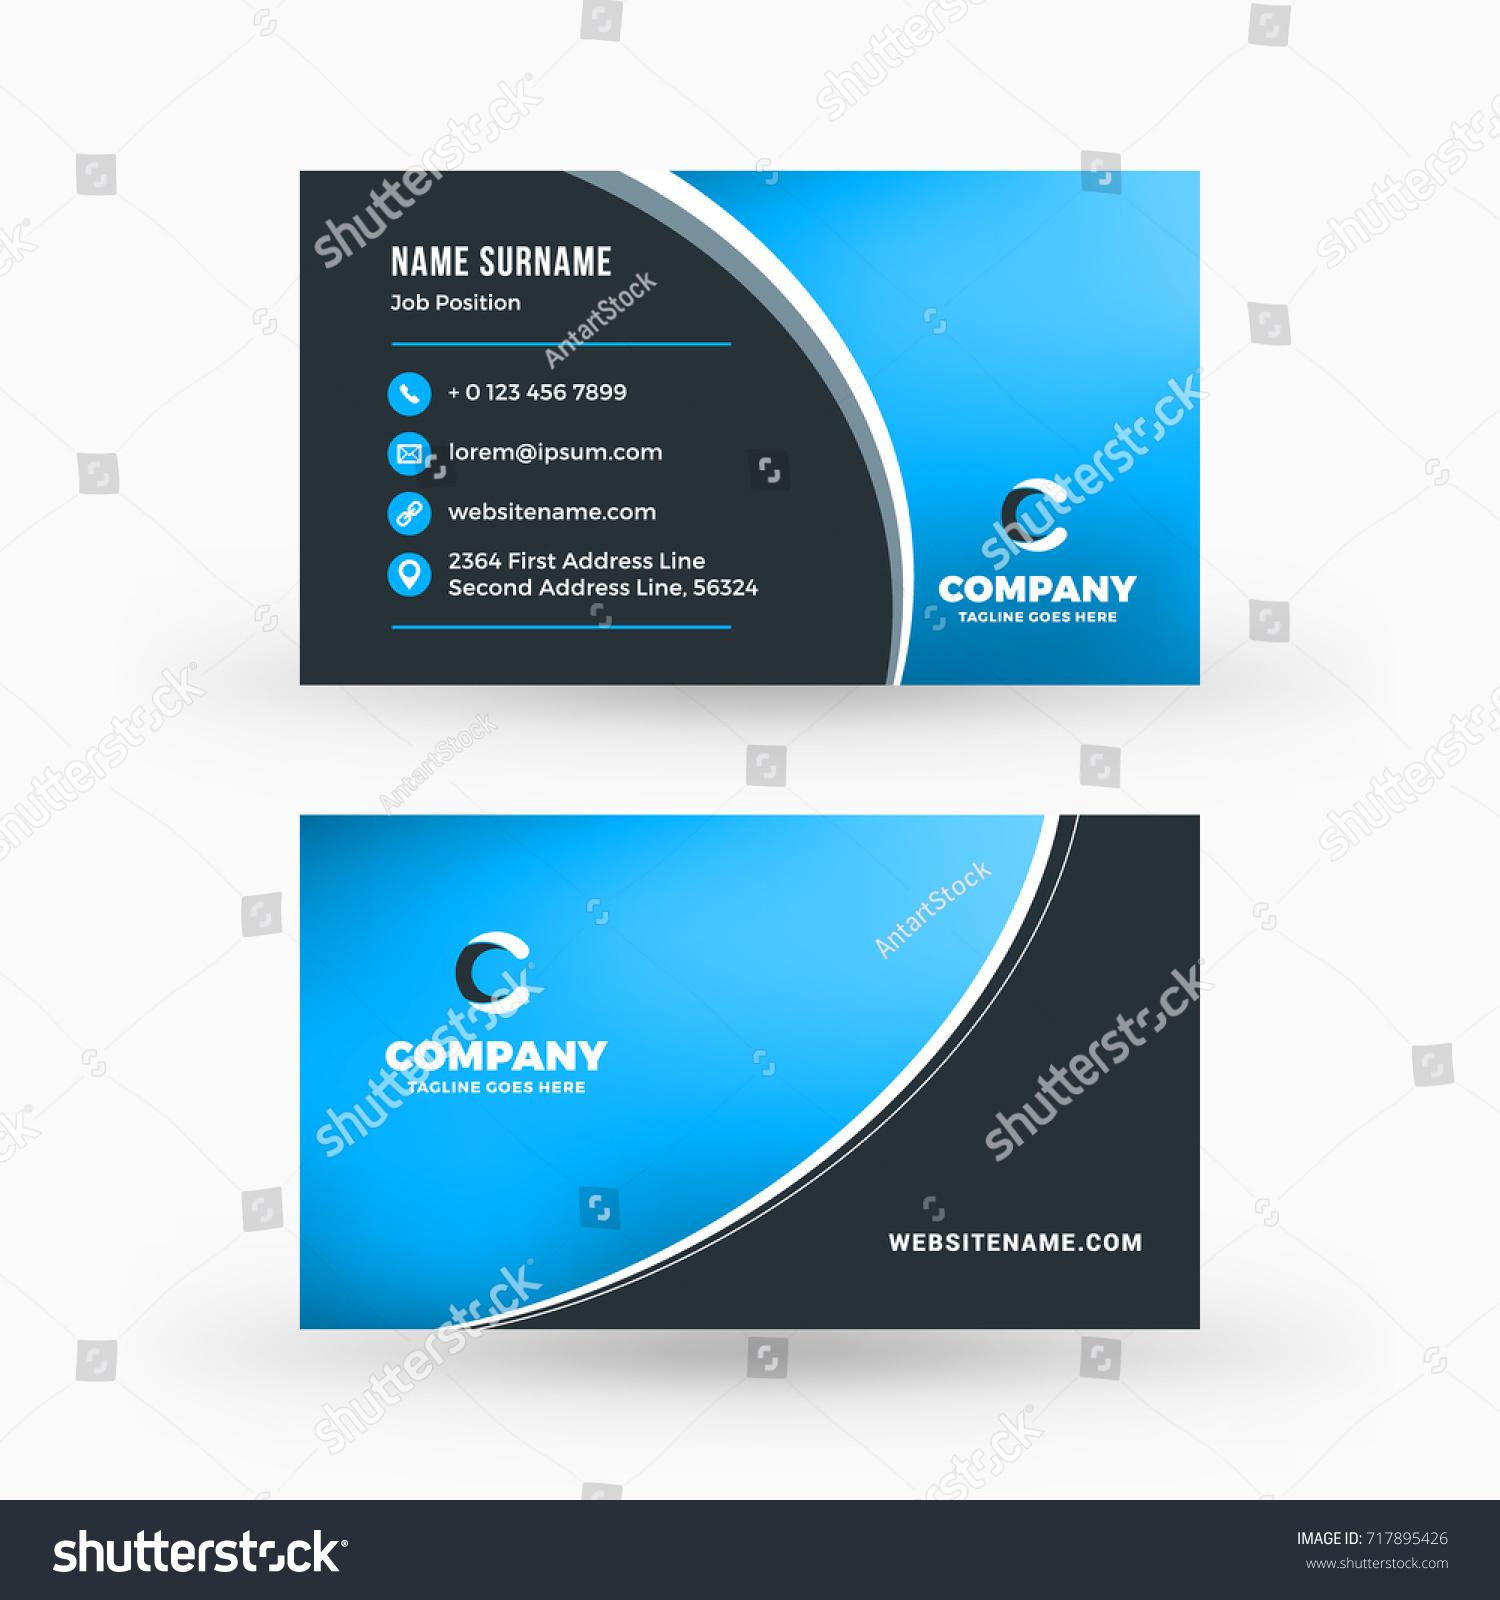 Creative Clean Doublesided Business Card Vector Stock Vector ...